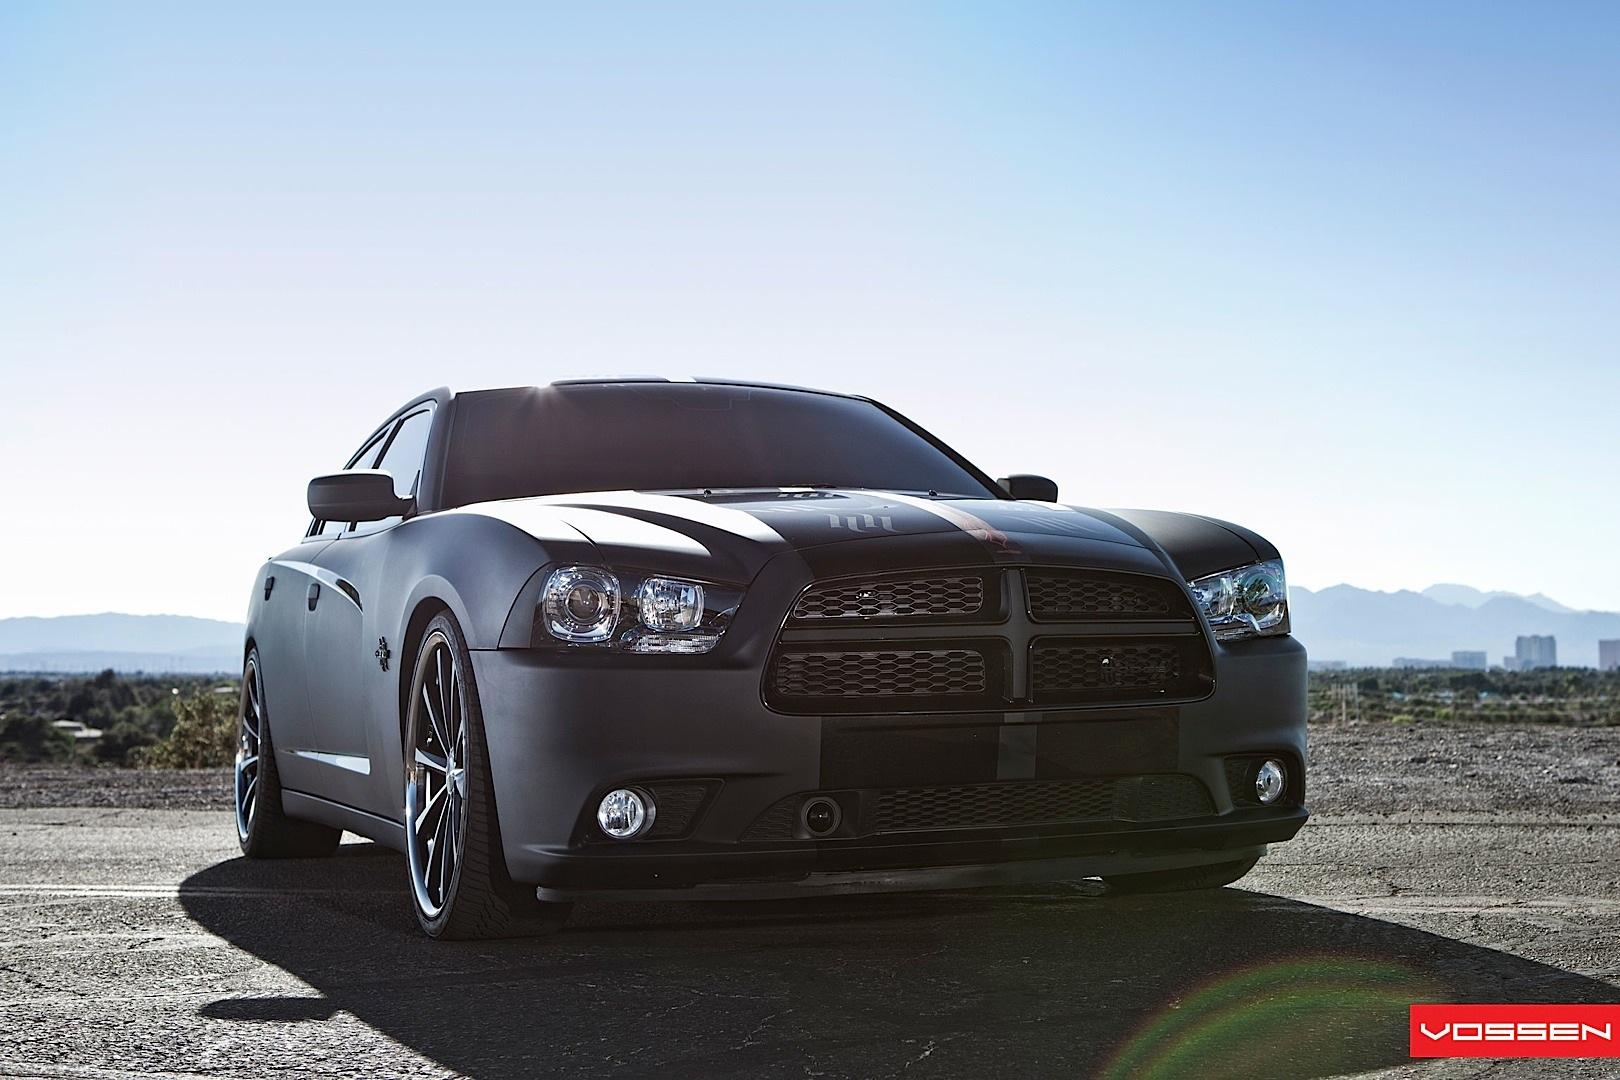 Dodge Charger Gets Matte Black Wrap And Vossen Wheels